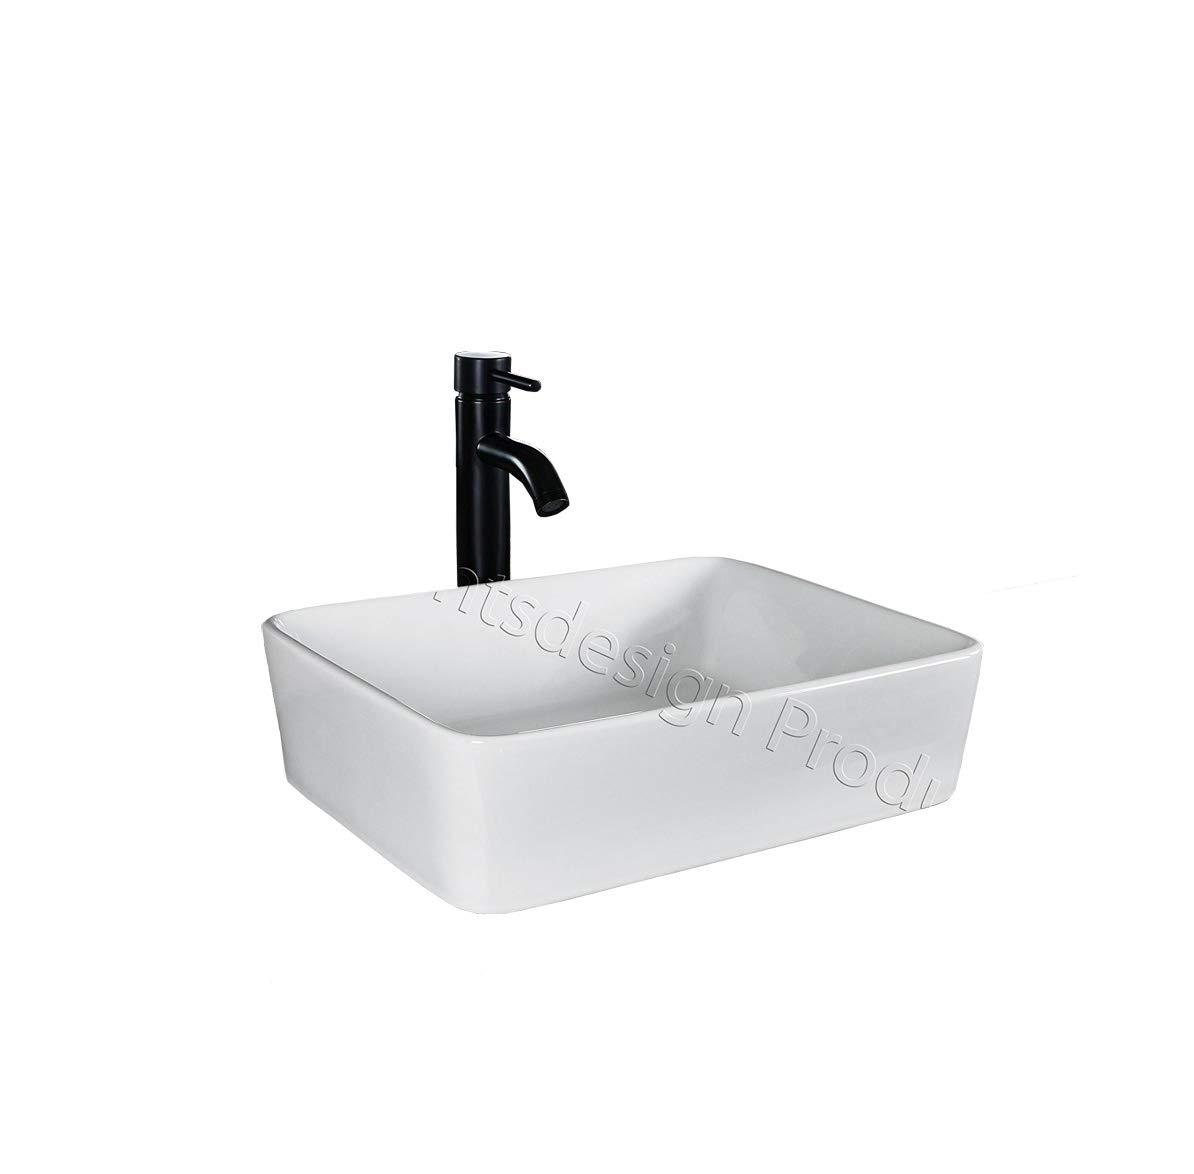 Bathroom Ceramic Porcelain Vessel Sink Cv7050e3 Oil Rubbed Bronze